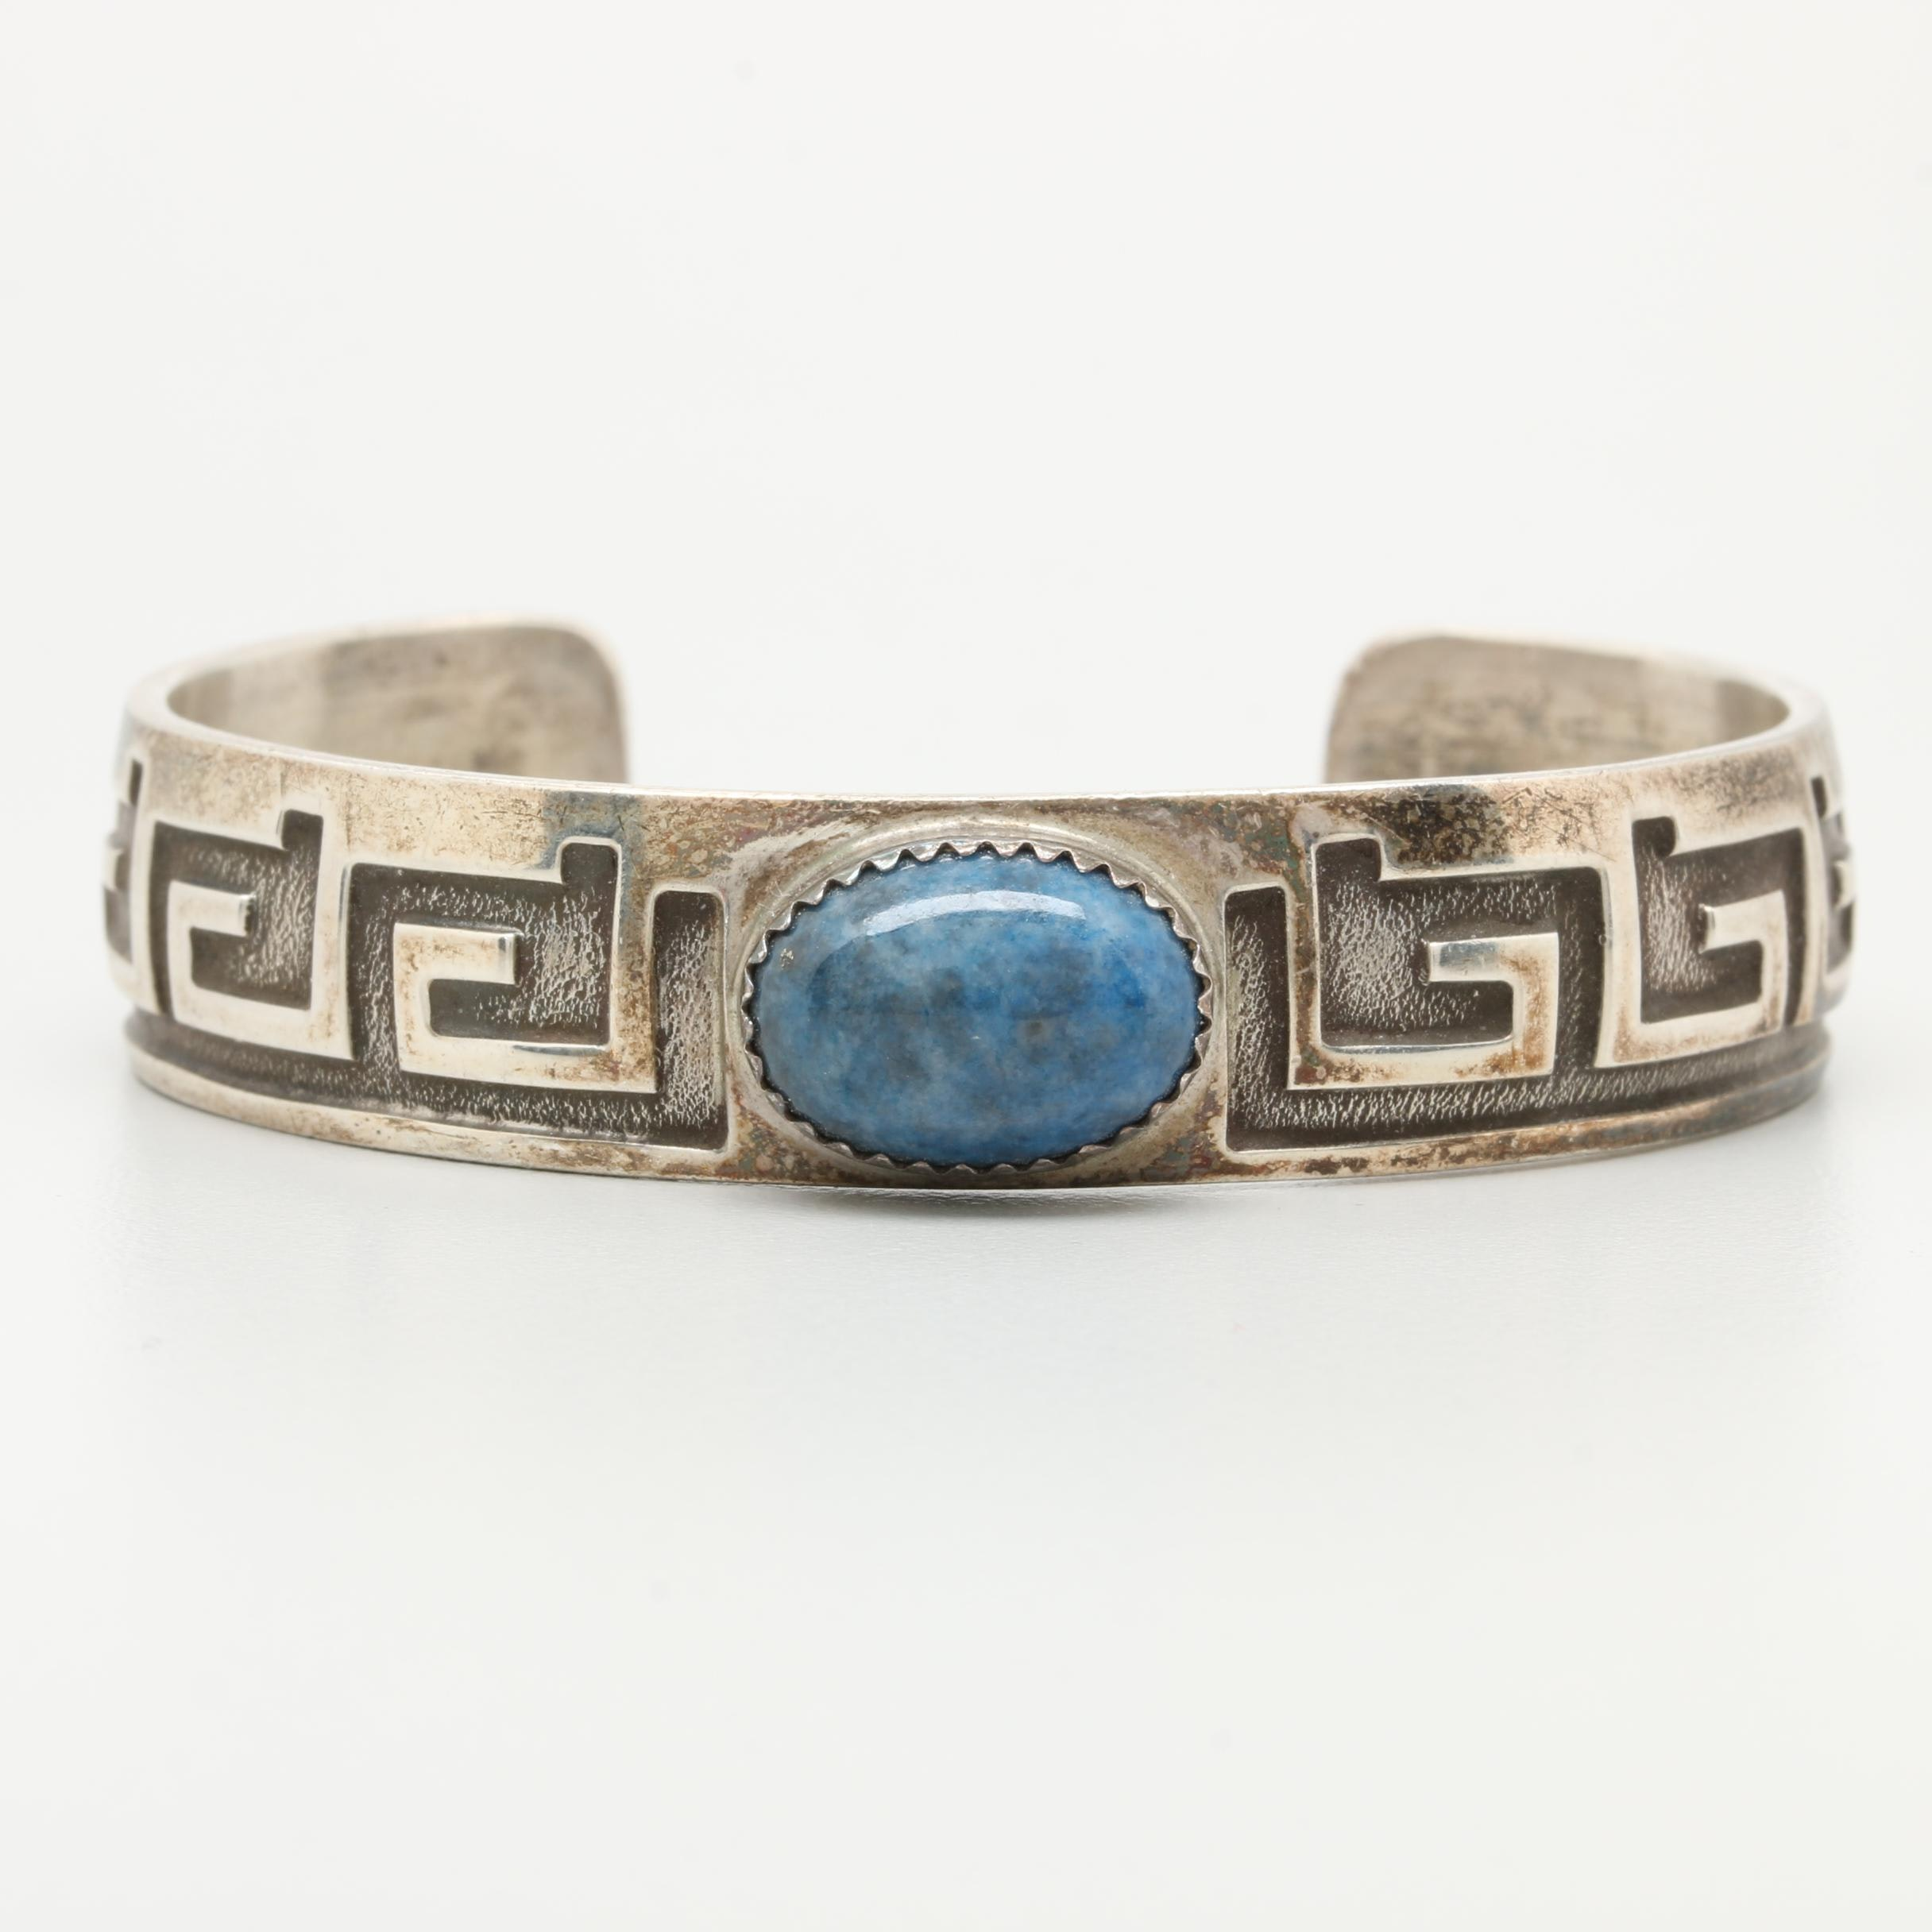 Wilton Carviso Jr. Navajo Diné Sterling Silver Denim Lapis Lazuli Cuff Bracelet